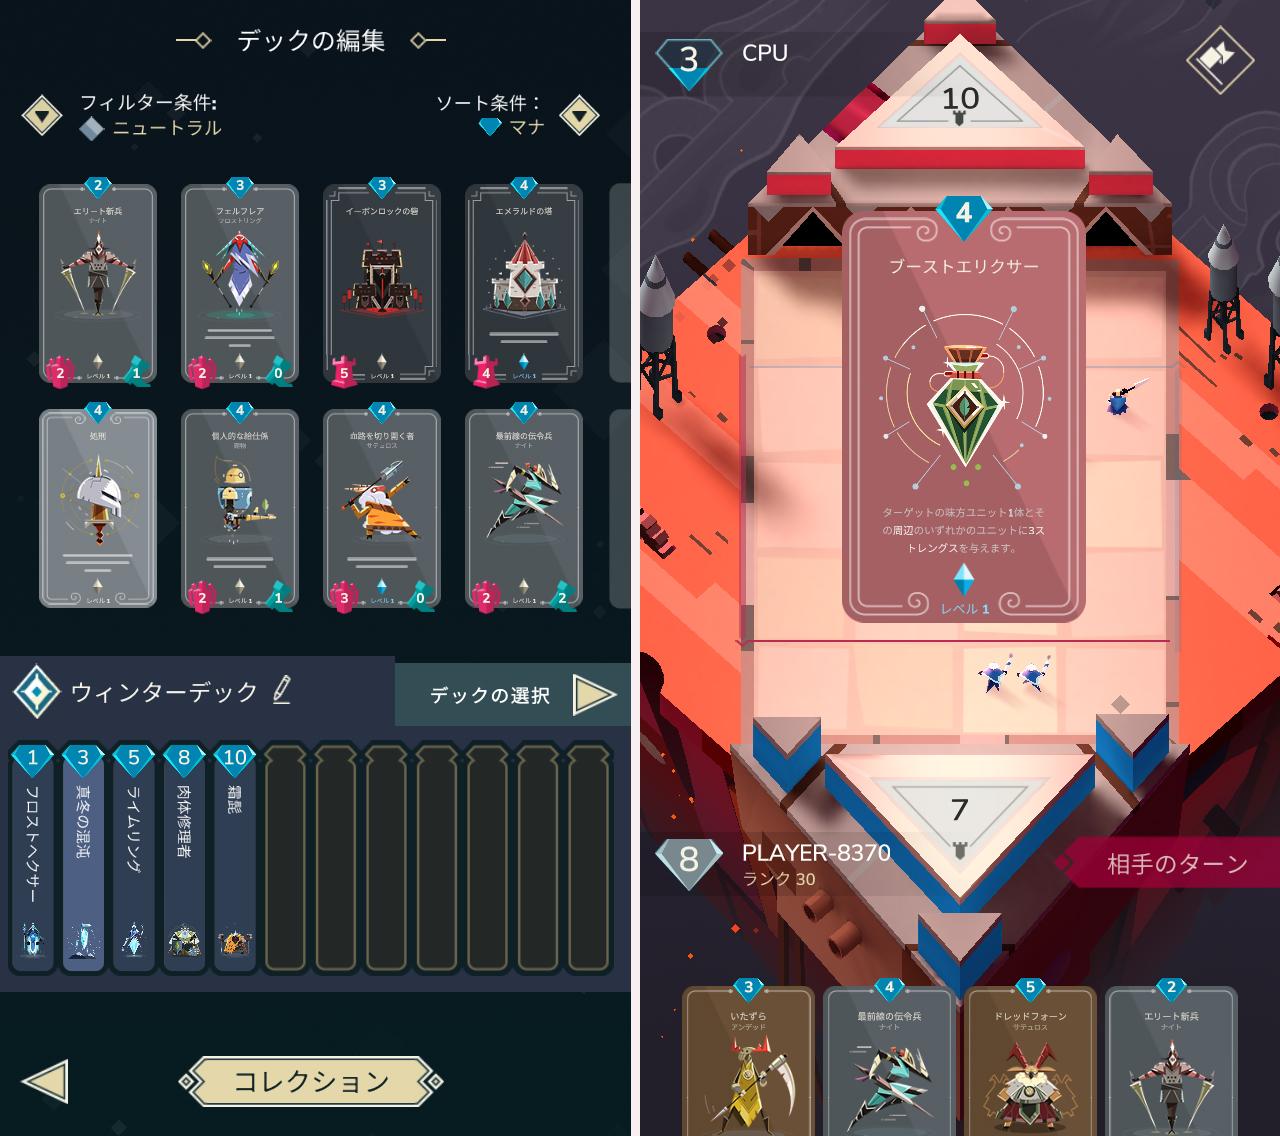 Stormbound: Kingdom Wars androidアプリスクリーンショット3